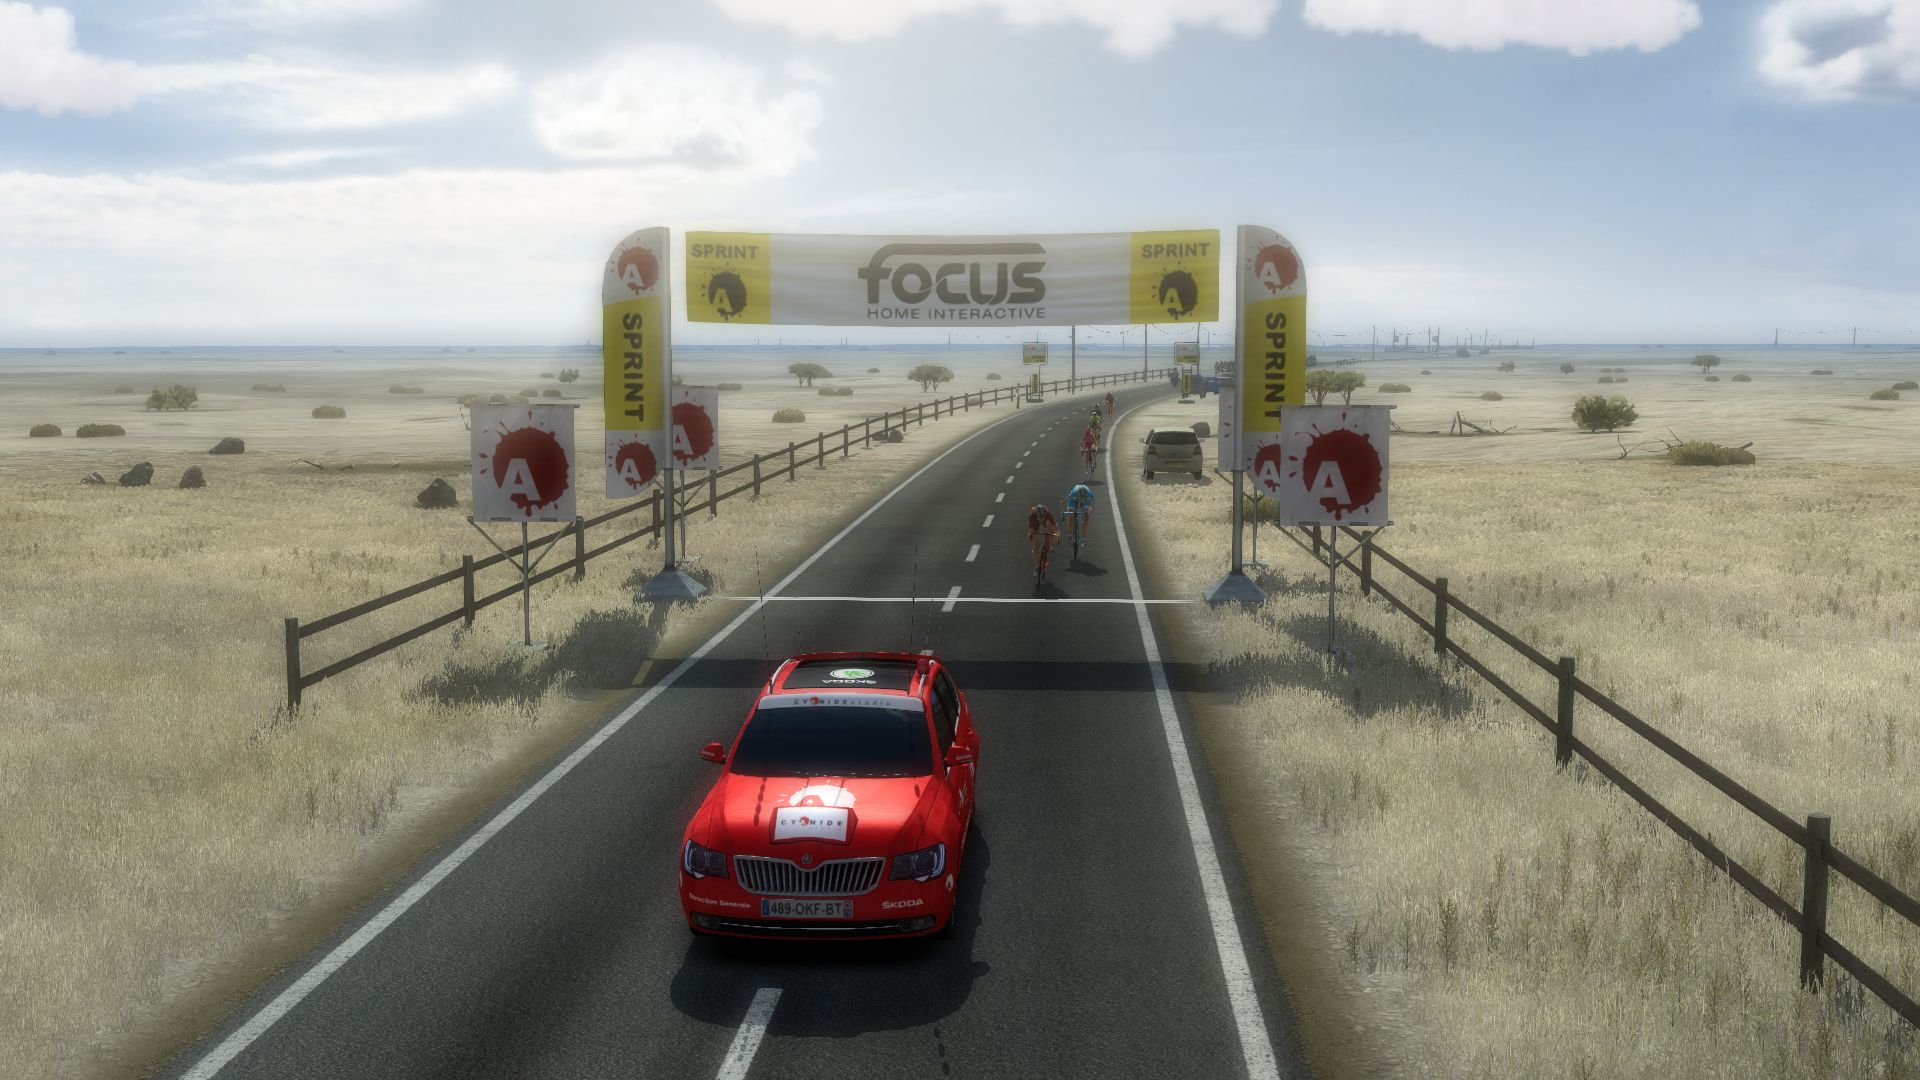 pcmdaily.com/images/mg/2019/Races/PT/Qatar/mg19_qat_s01_06.jpg